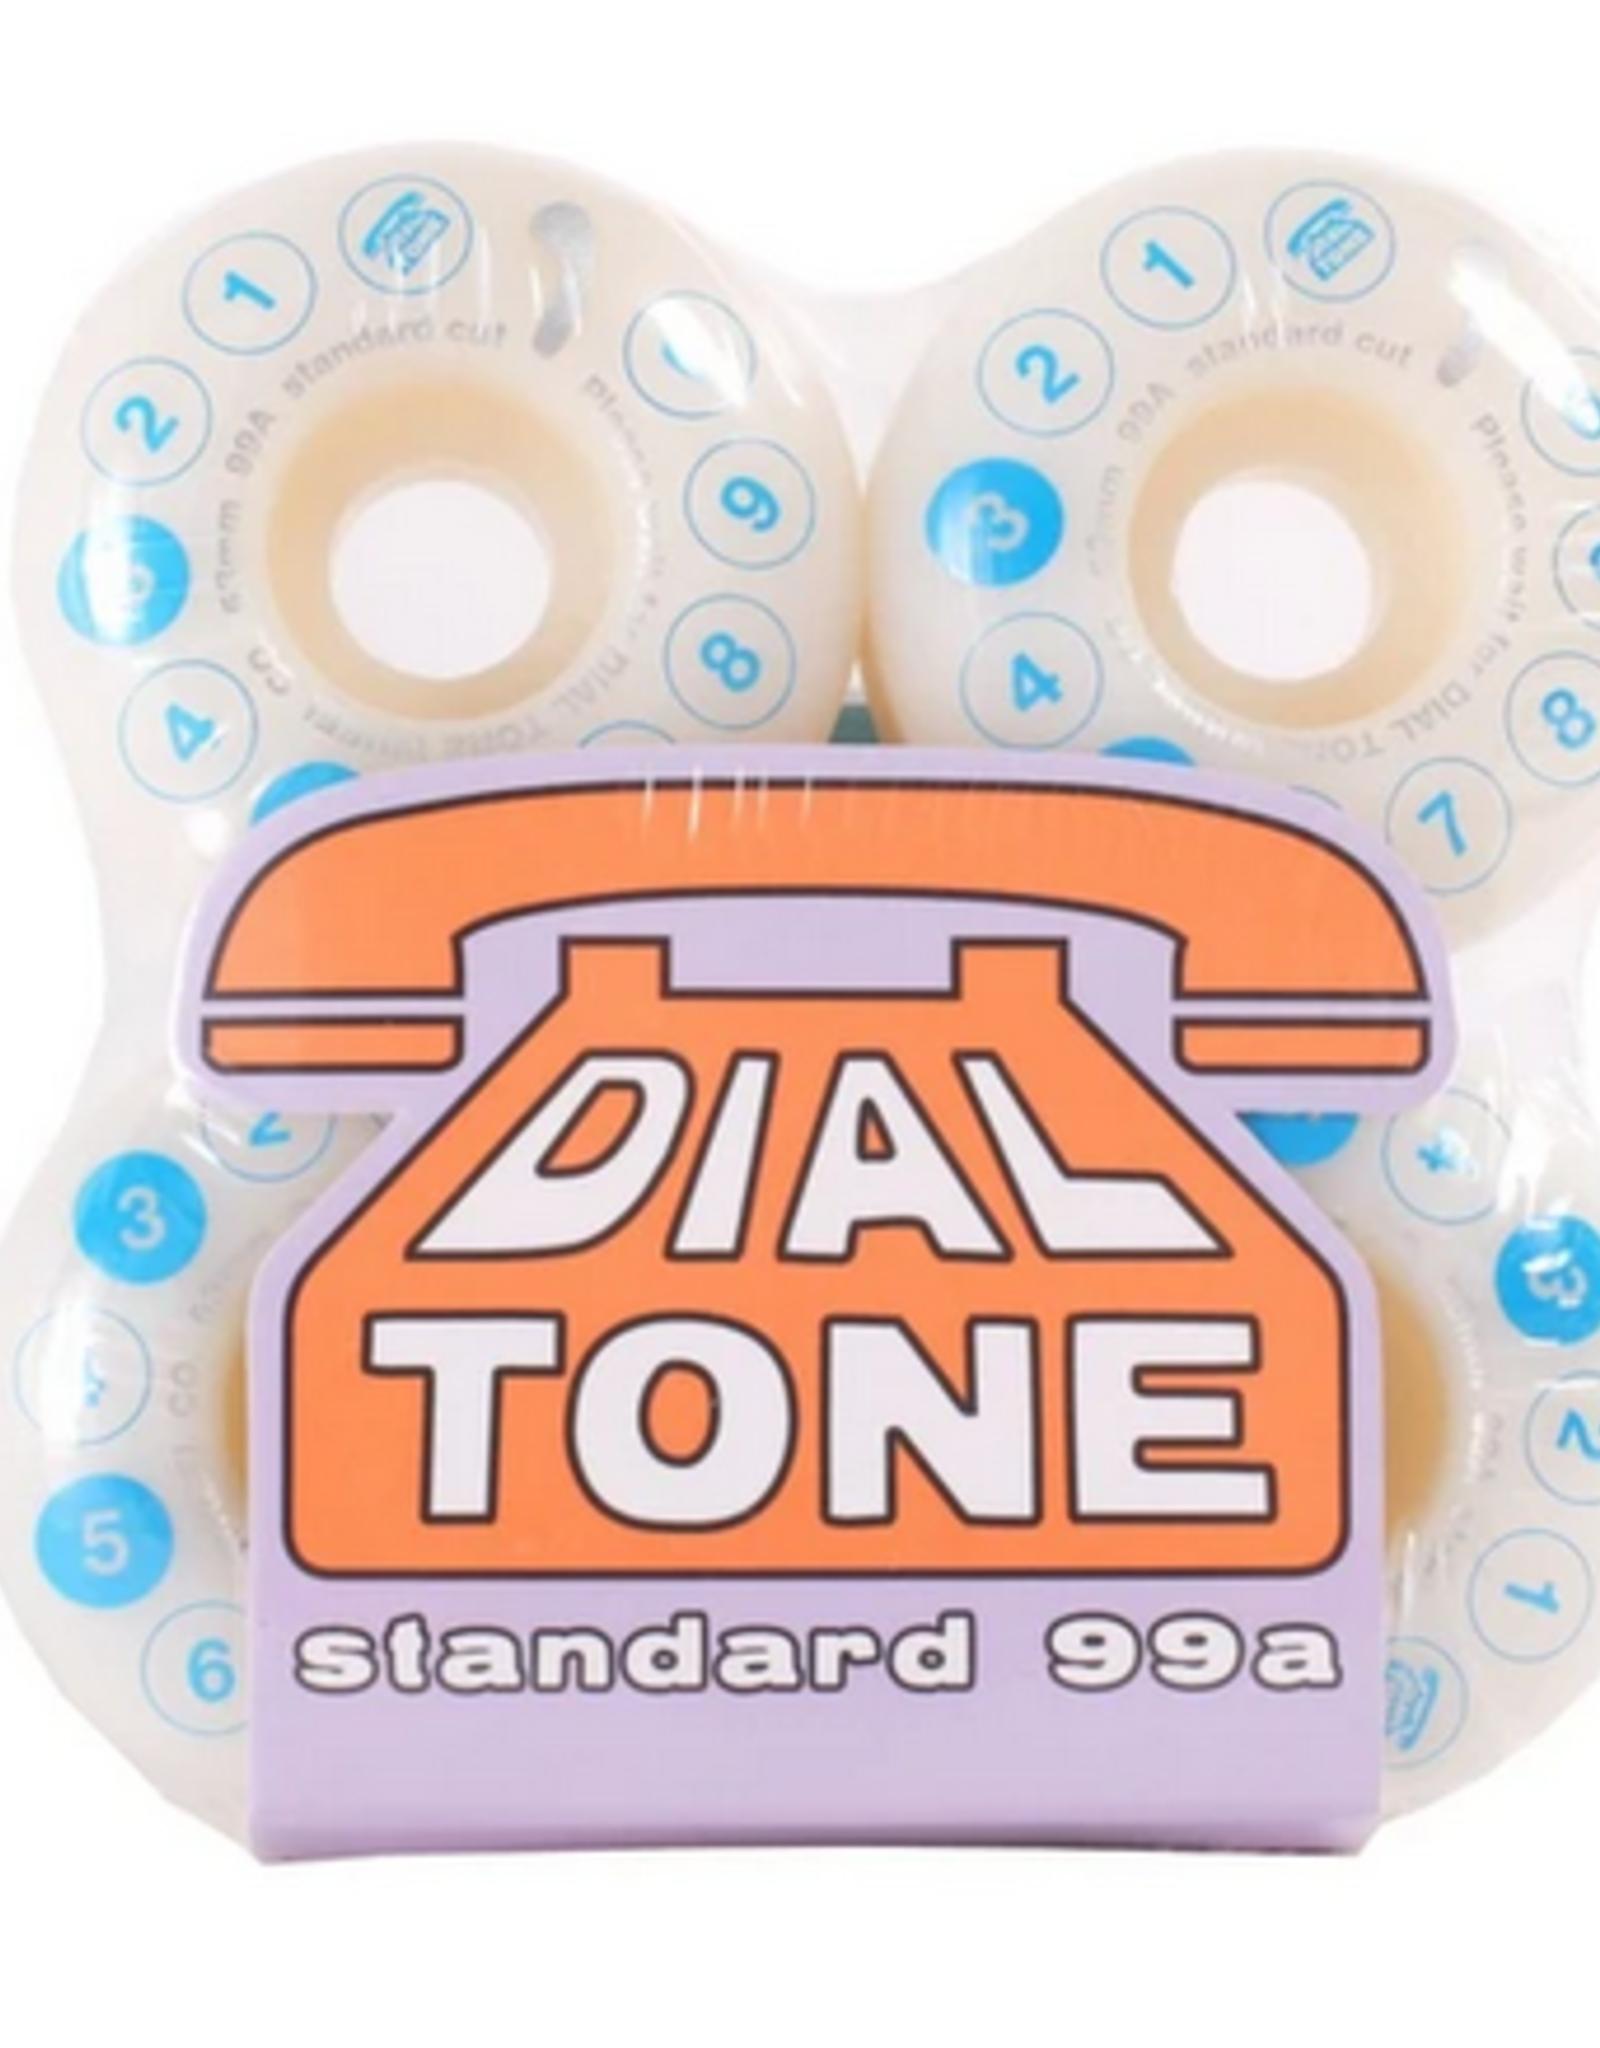 DIAL TONE DIAL TONE 53MM 99A ROTARY DIGITAL STANDARD WHEELS